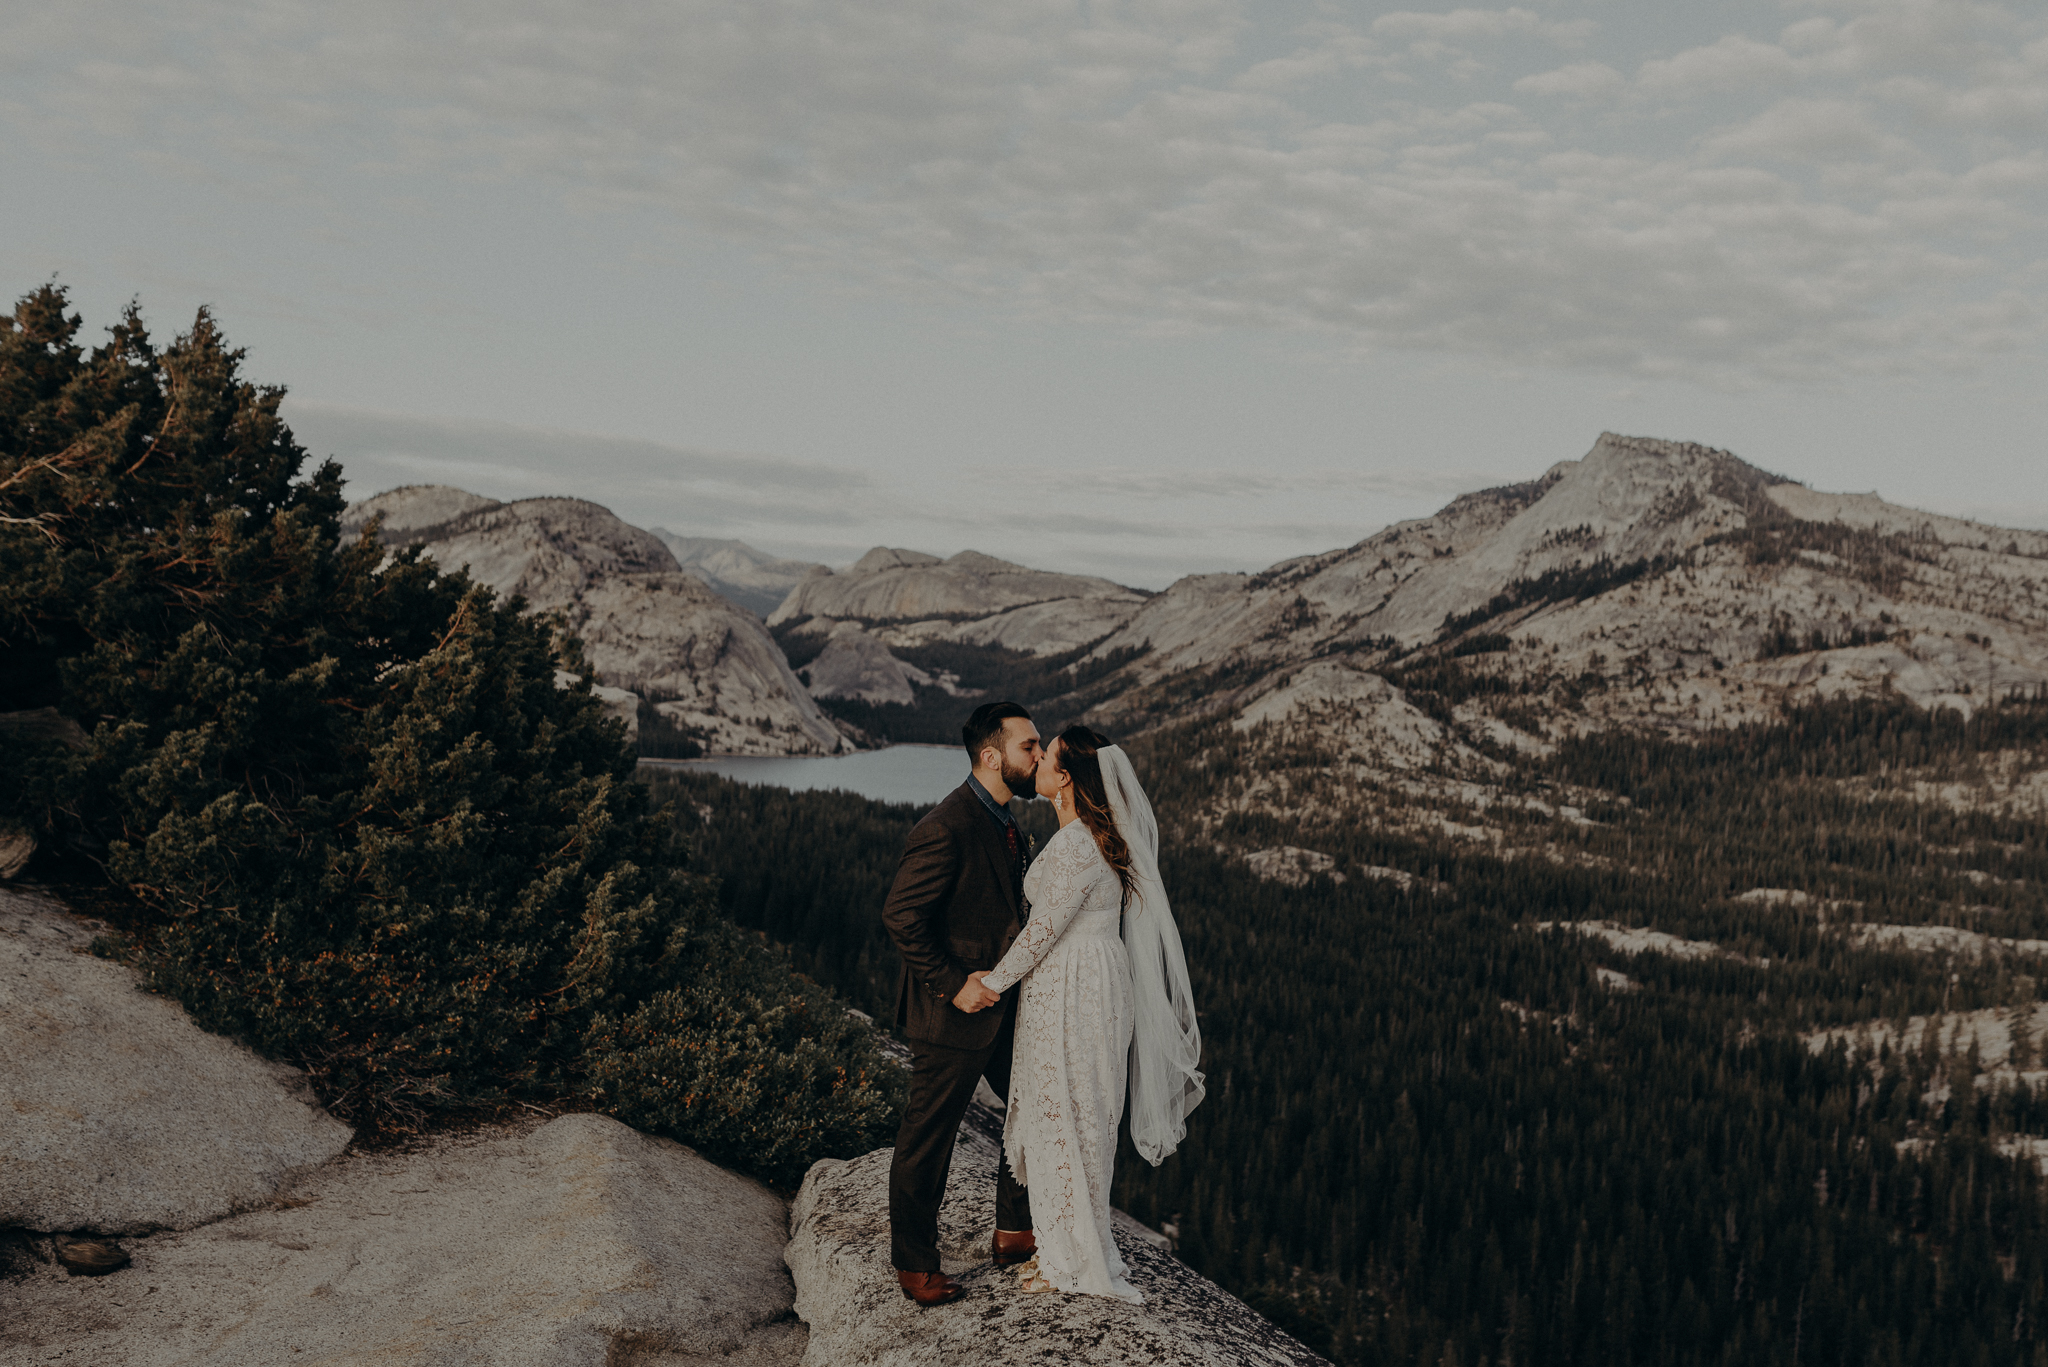 Yosemite Elopement Photographer - Evergreen Lodge Wedding Photographer - IsaiahAndTaylor.com-021.jpg